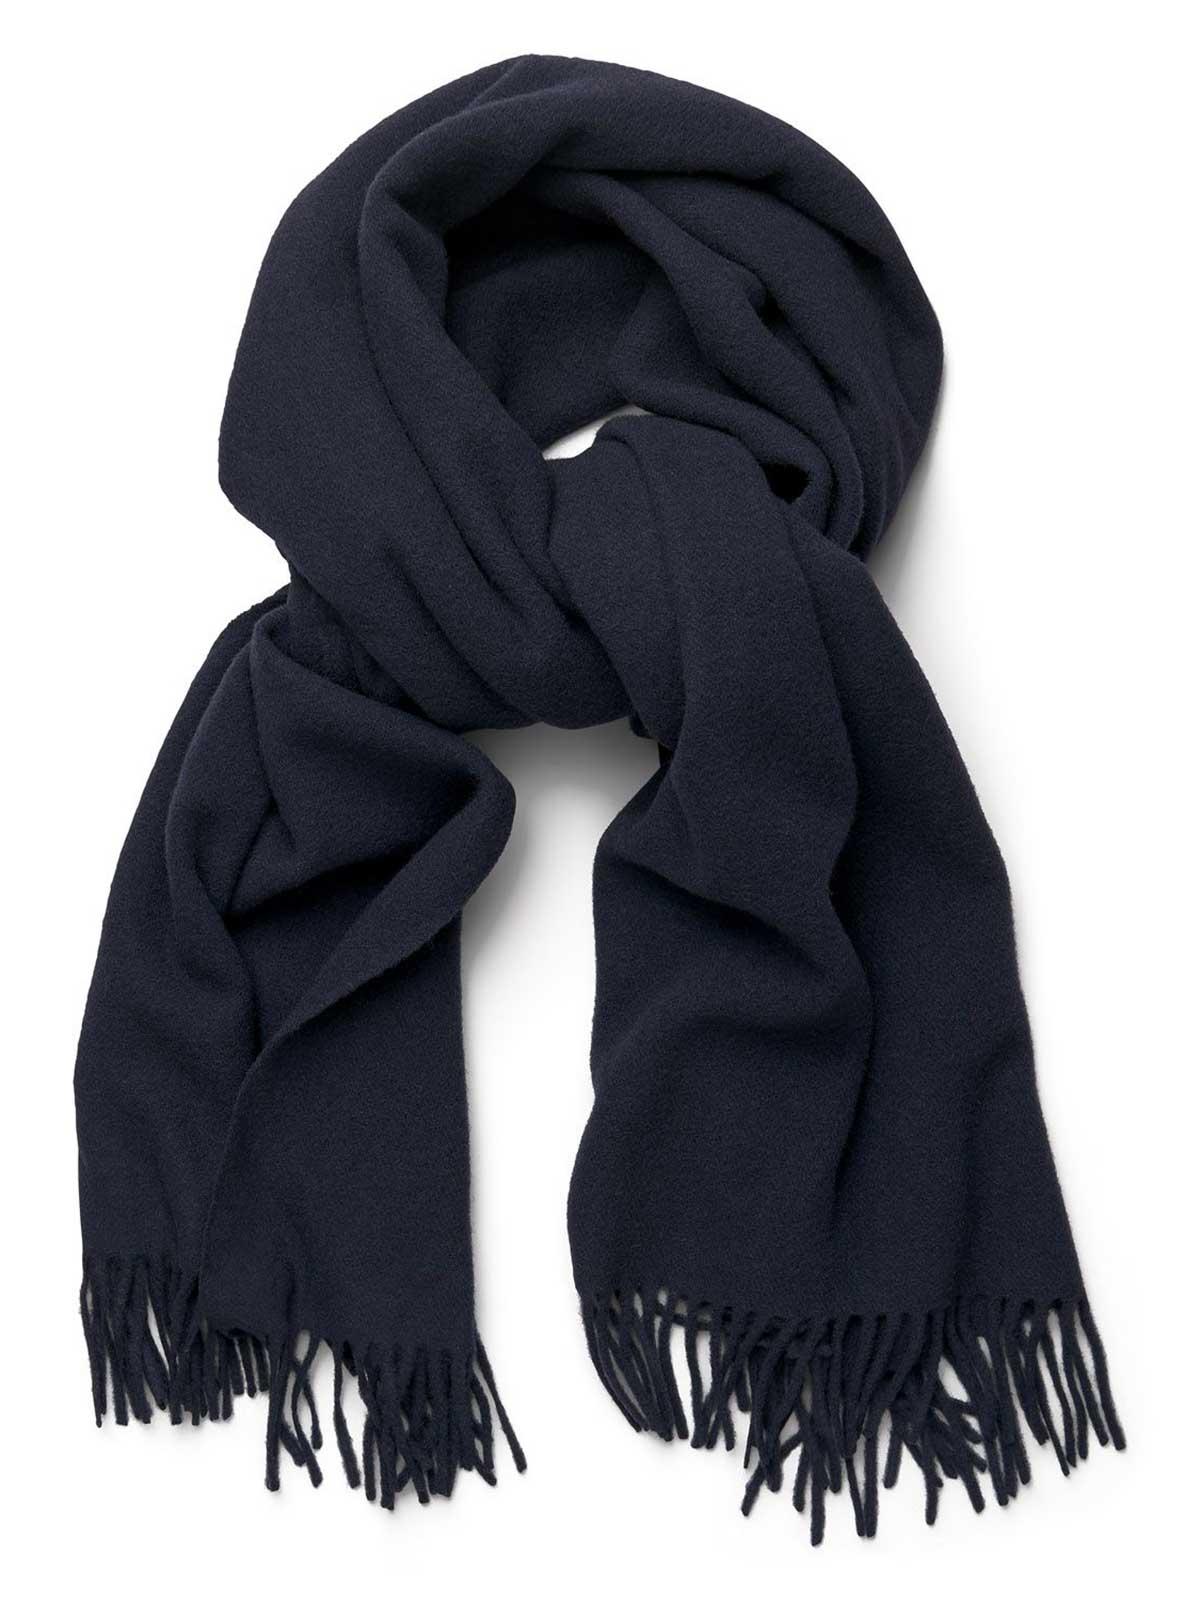 gant big wool scarf 405 1703 9928020 botta b store